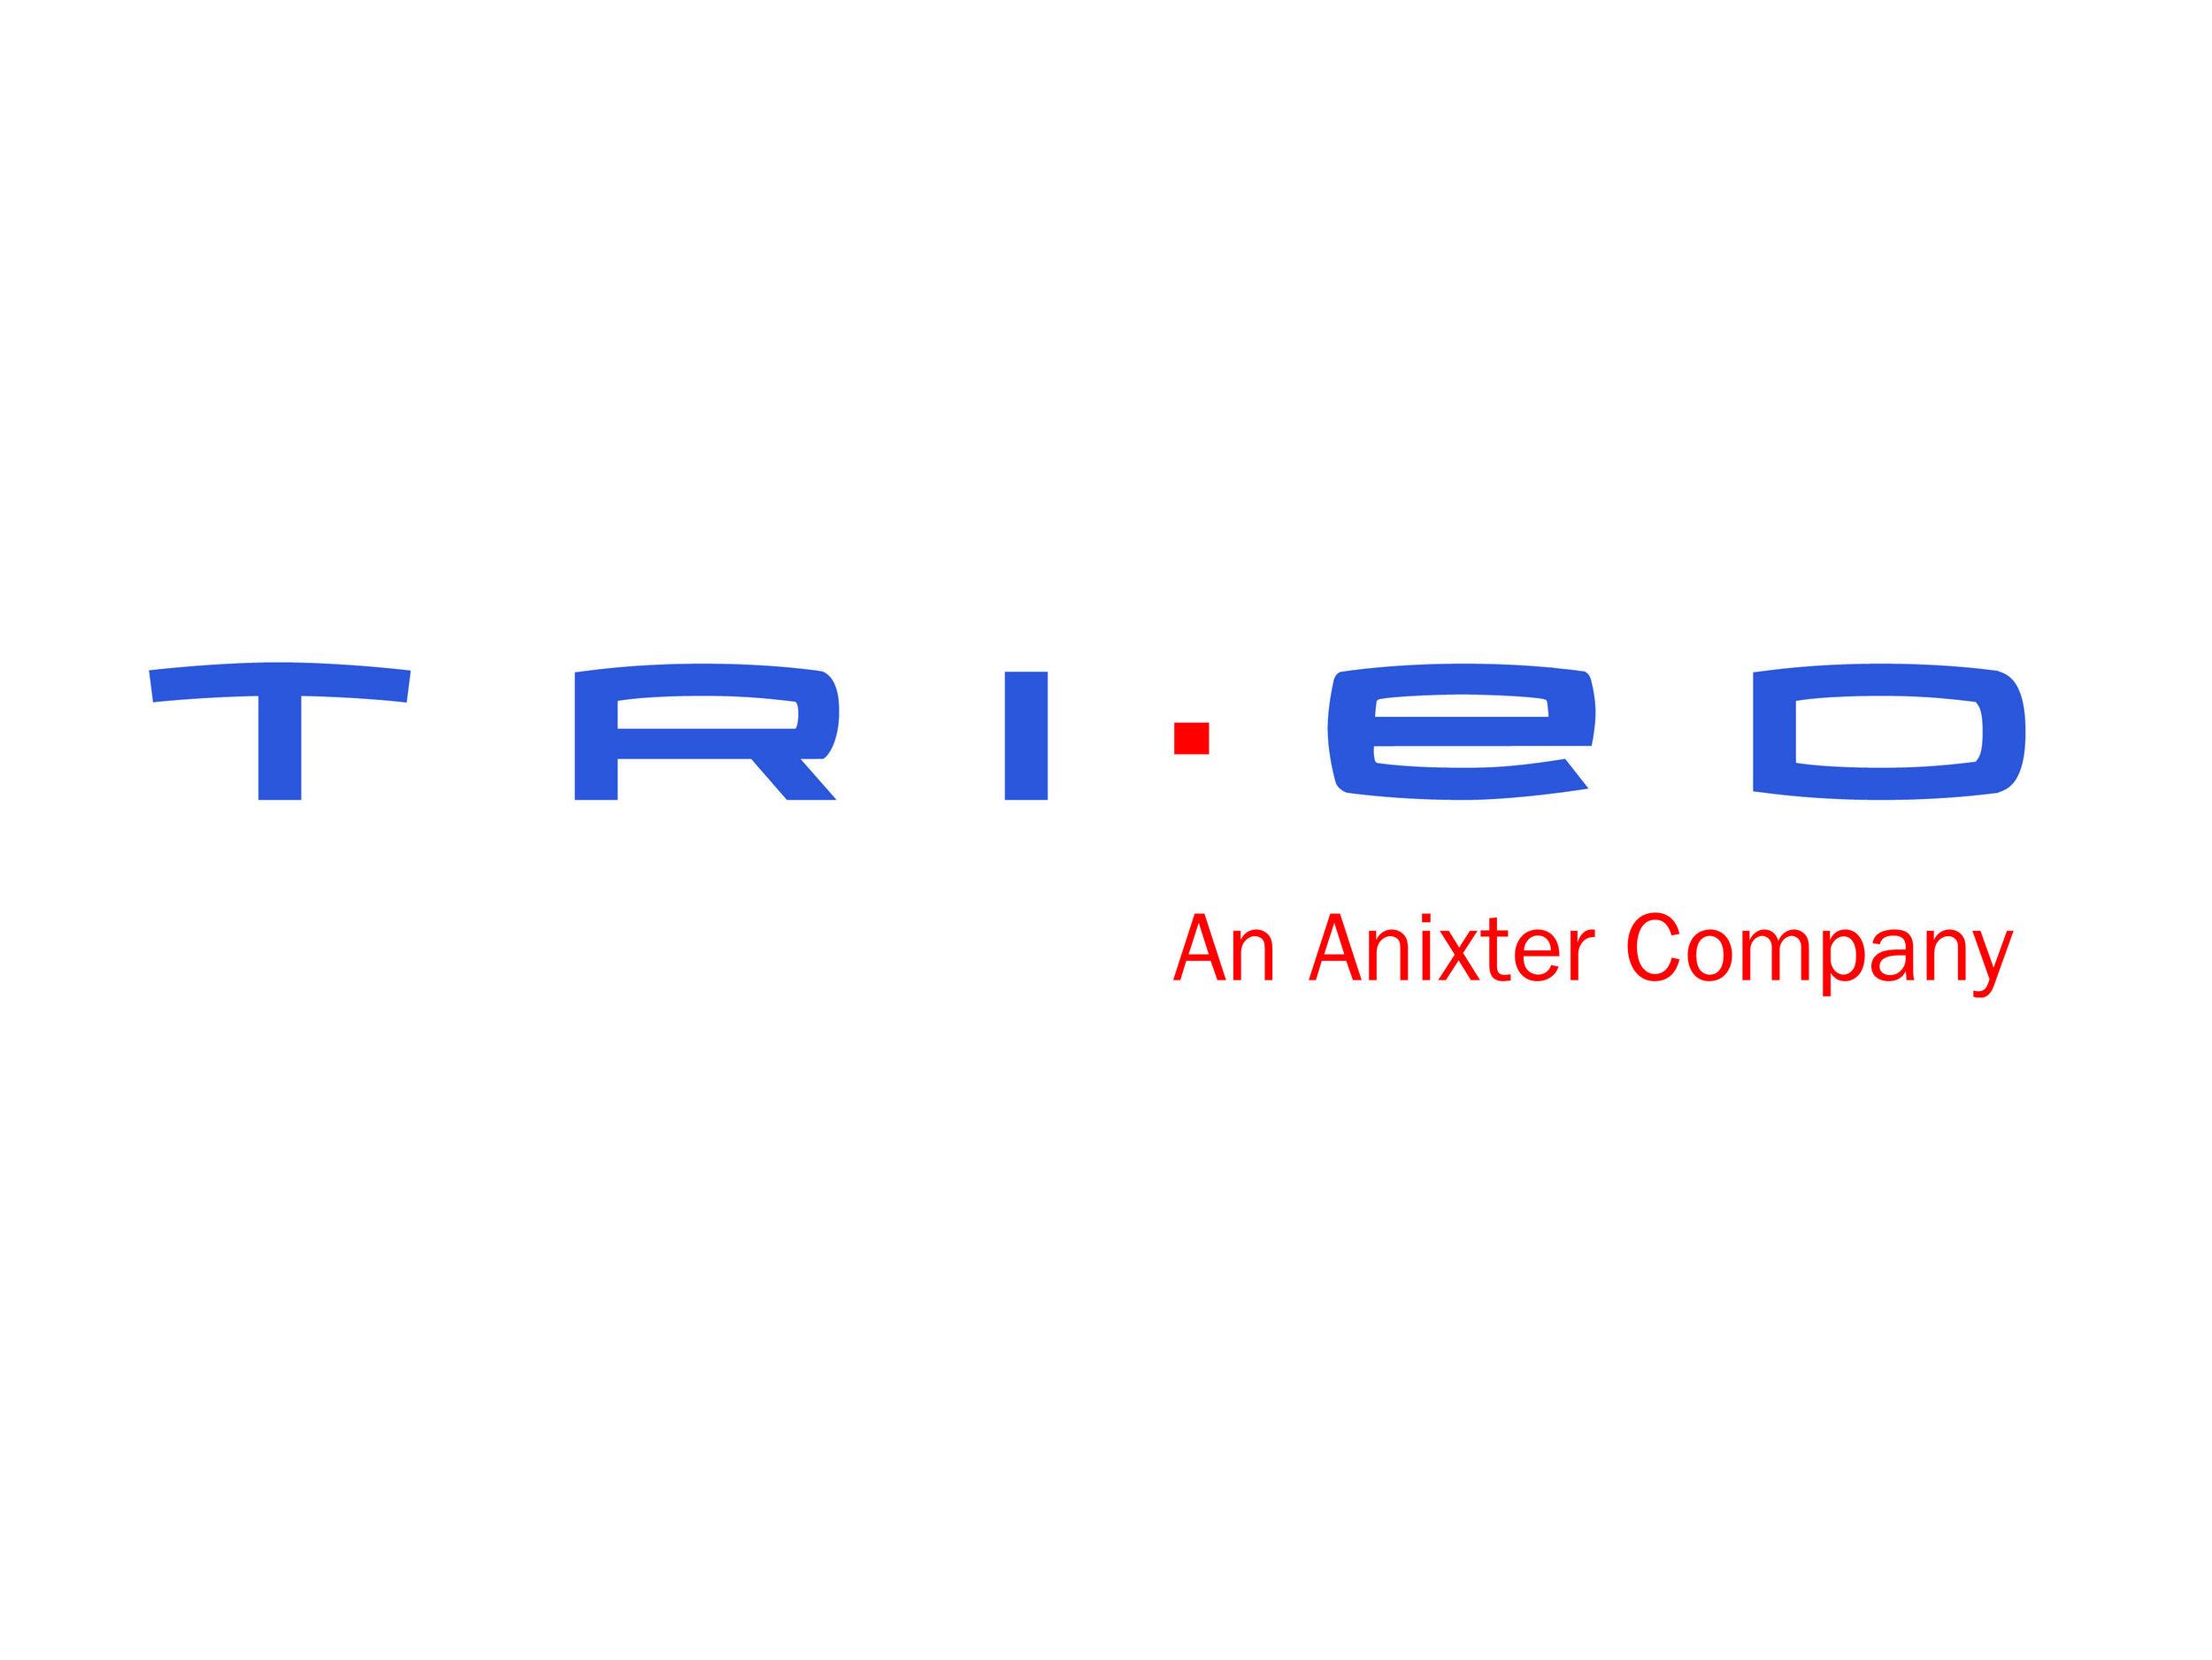 TRI-ED-AXE-logo-cmyk 2015.jpg